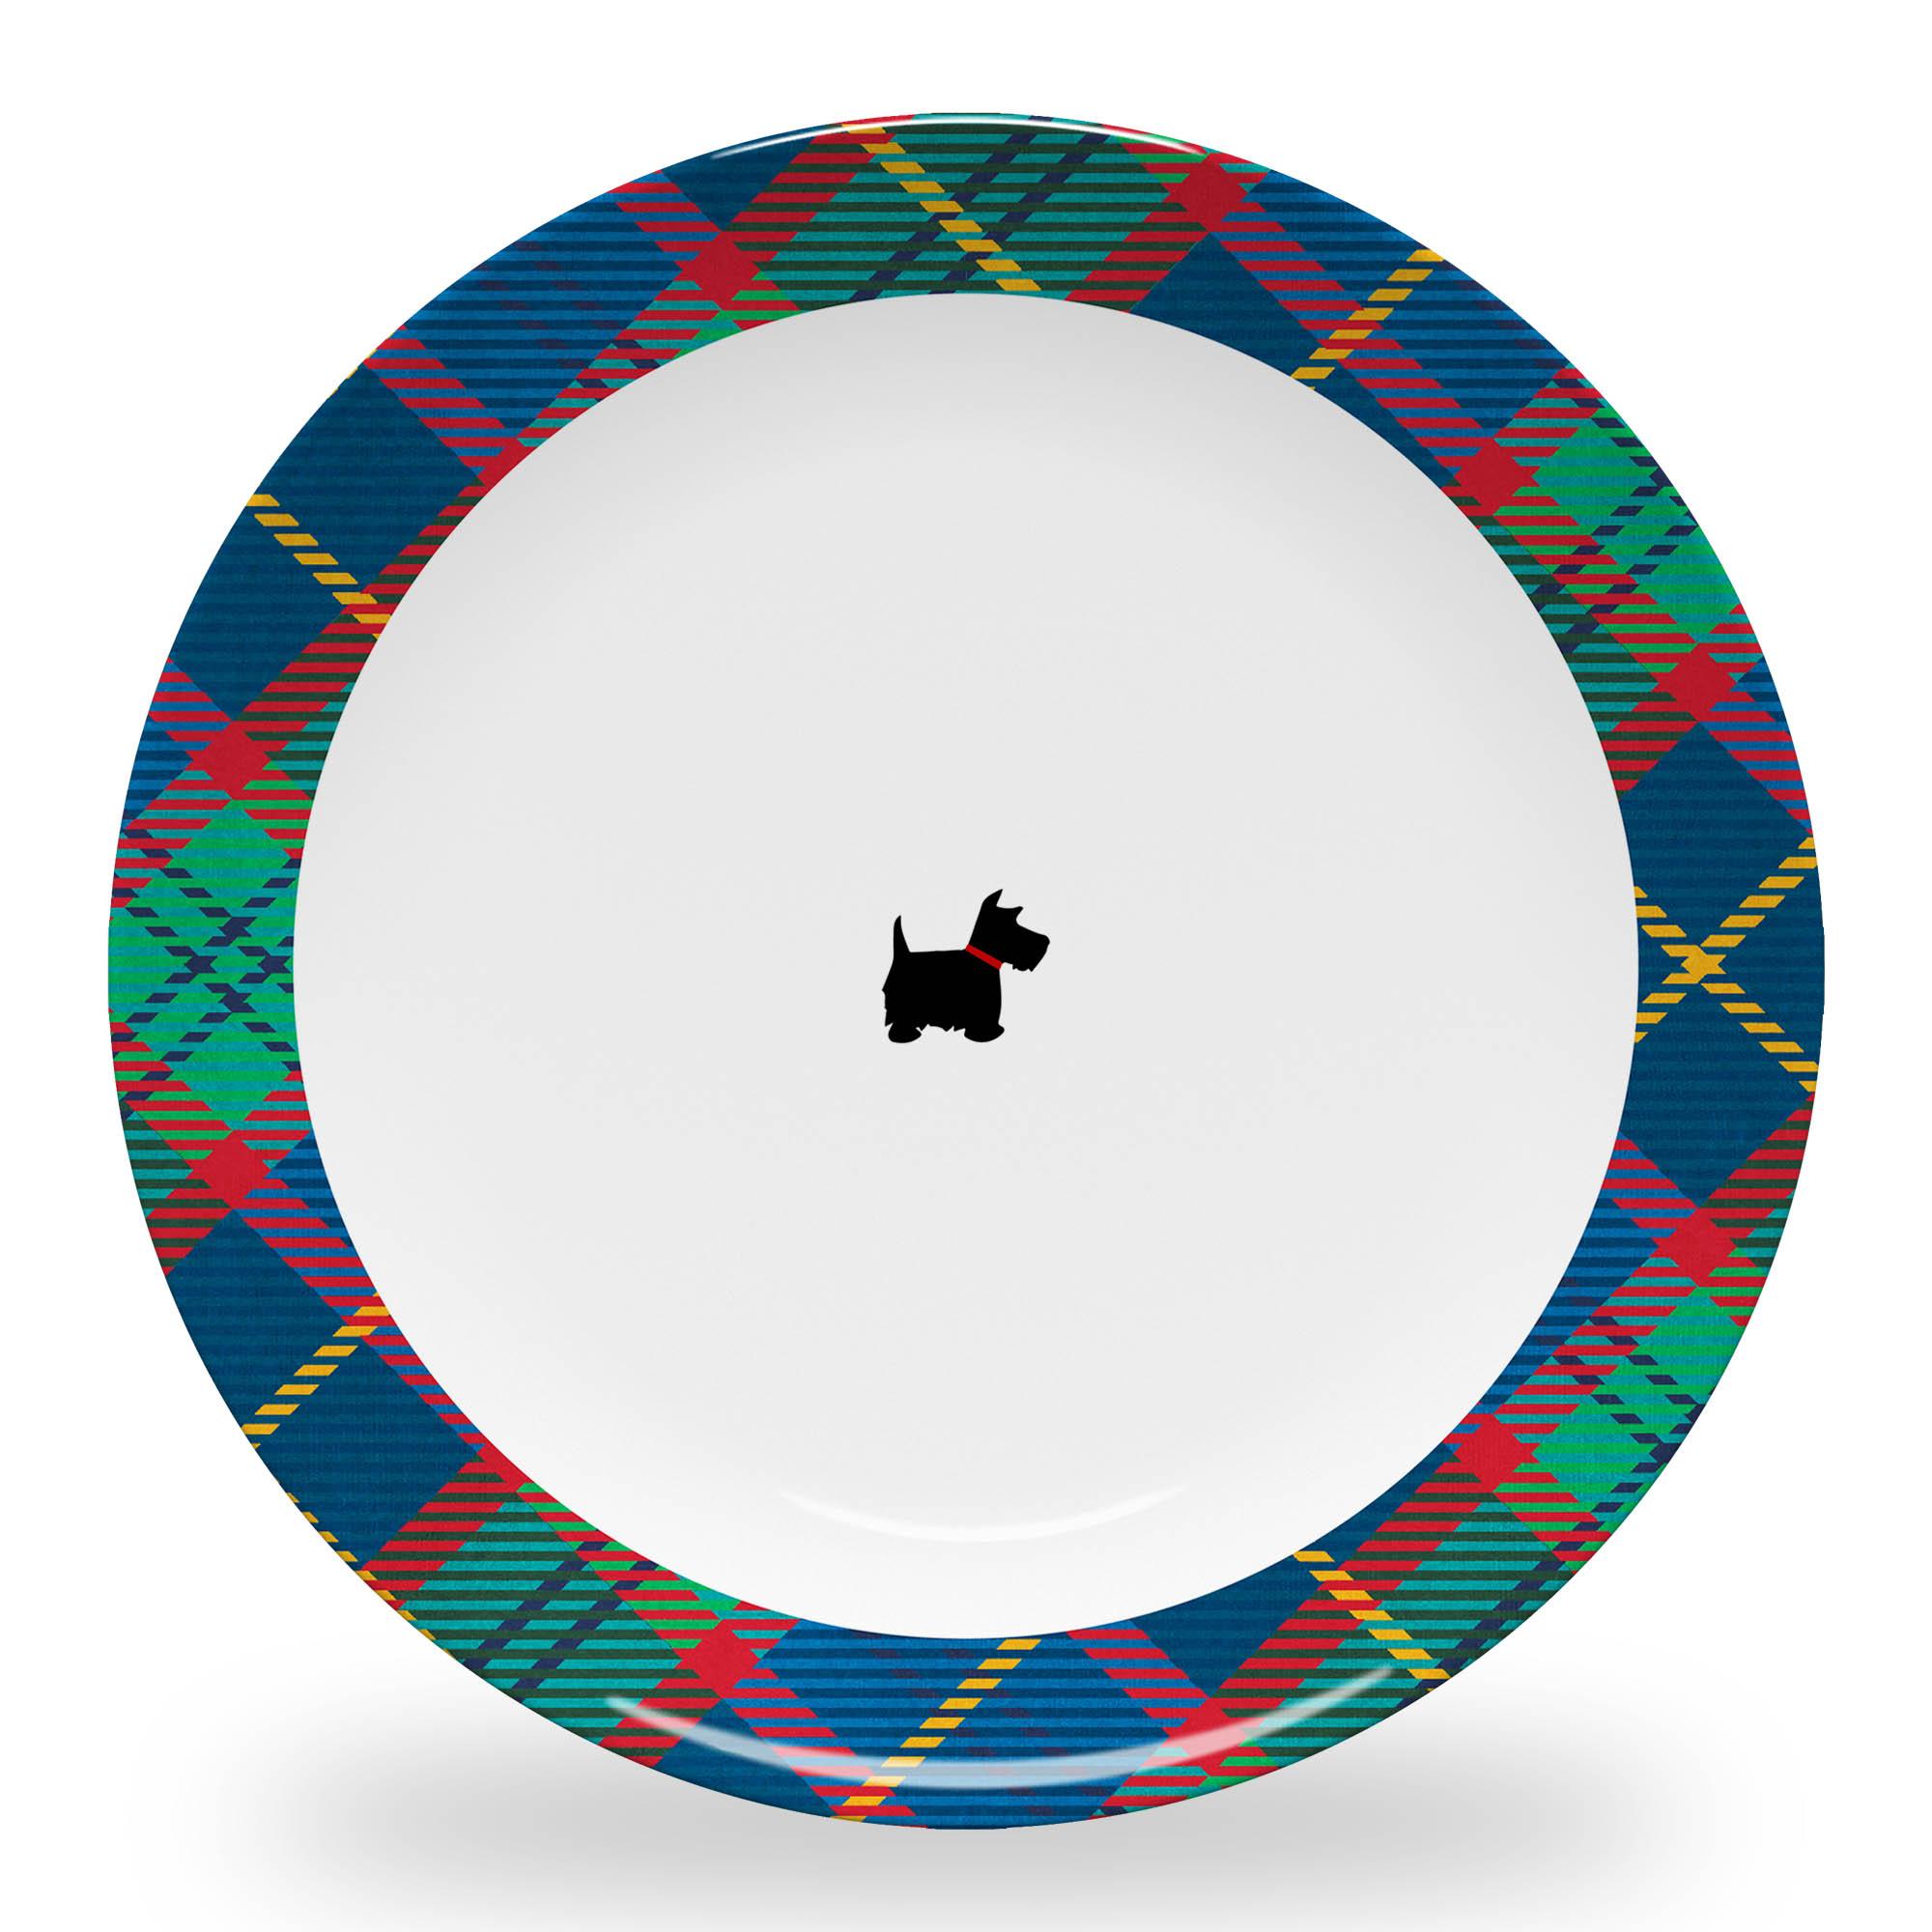 Tartan Plate with Scottie Dog